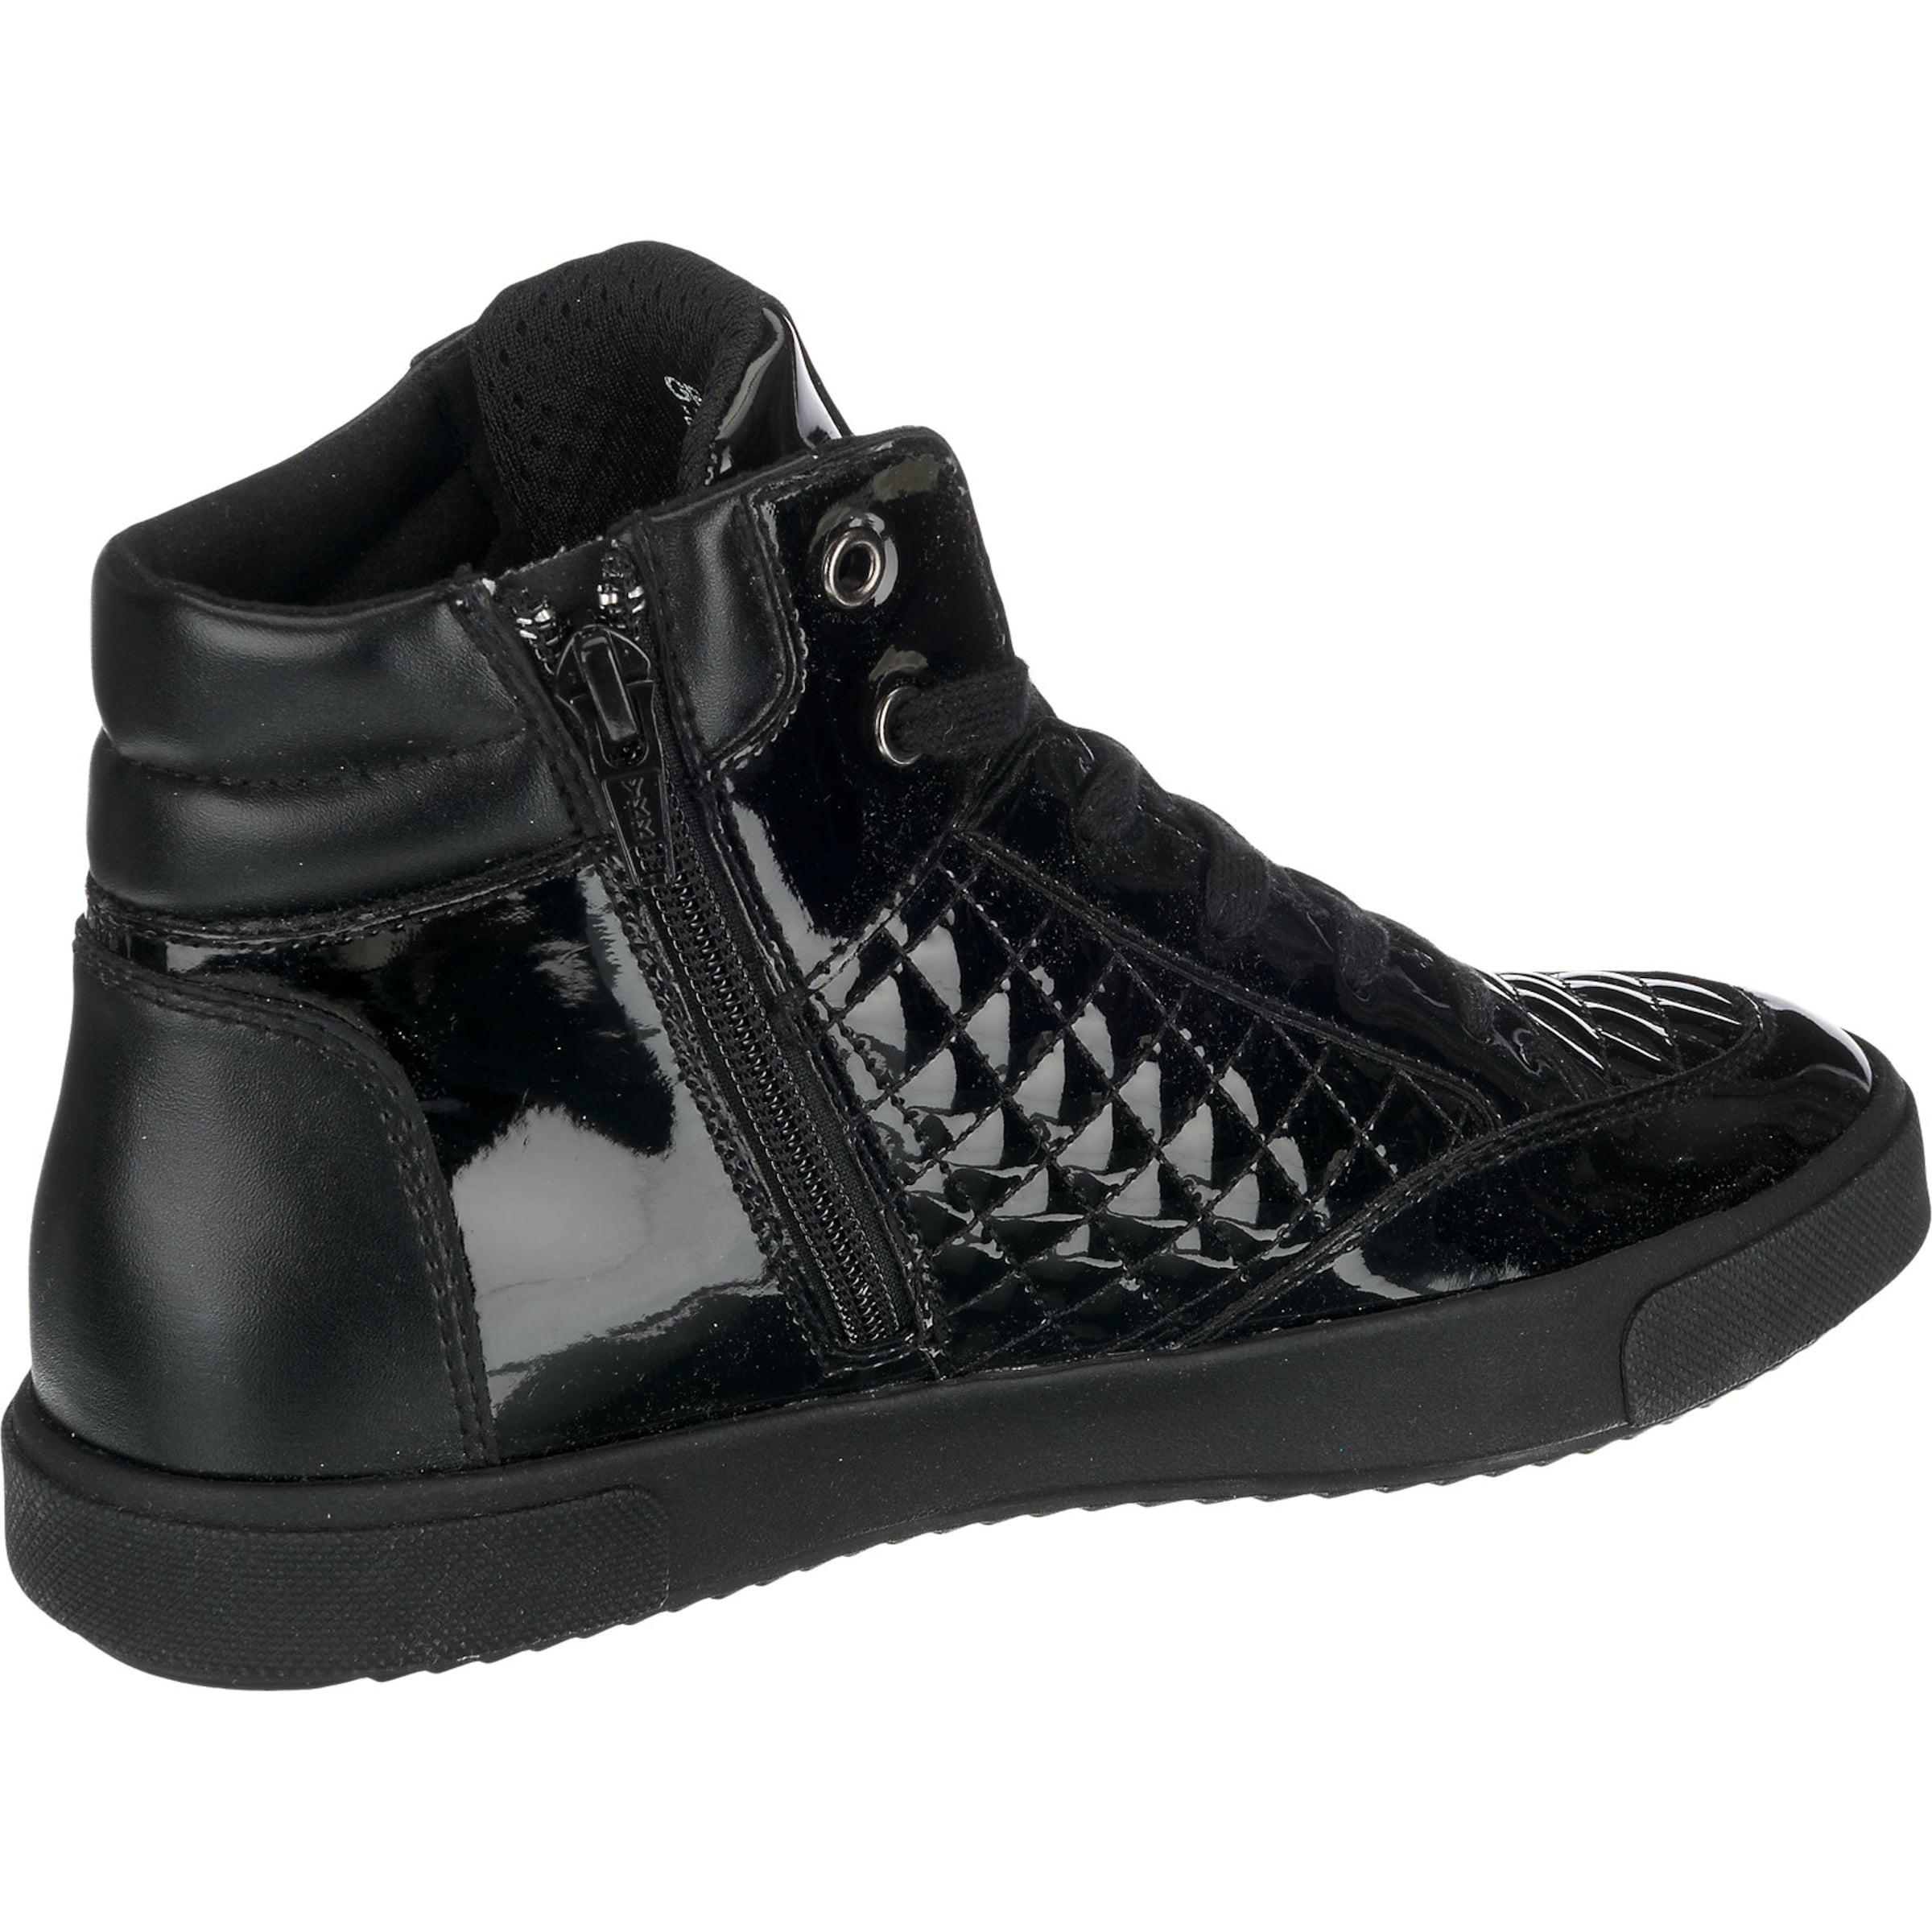 GEOX Blomiee Sneakers Sie Günstig Online Qualität oOObZ